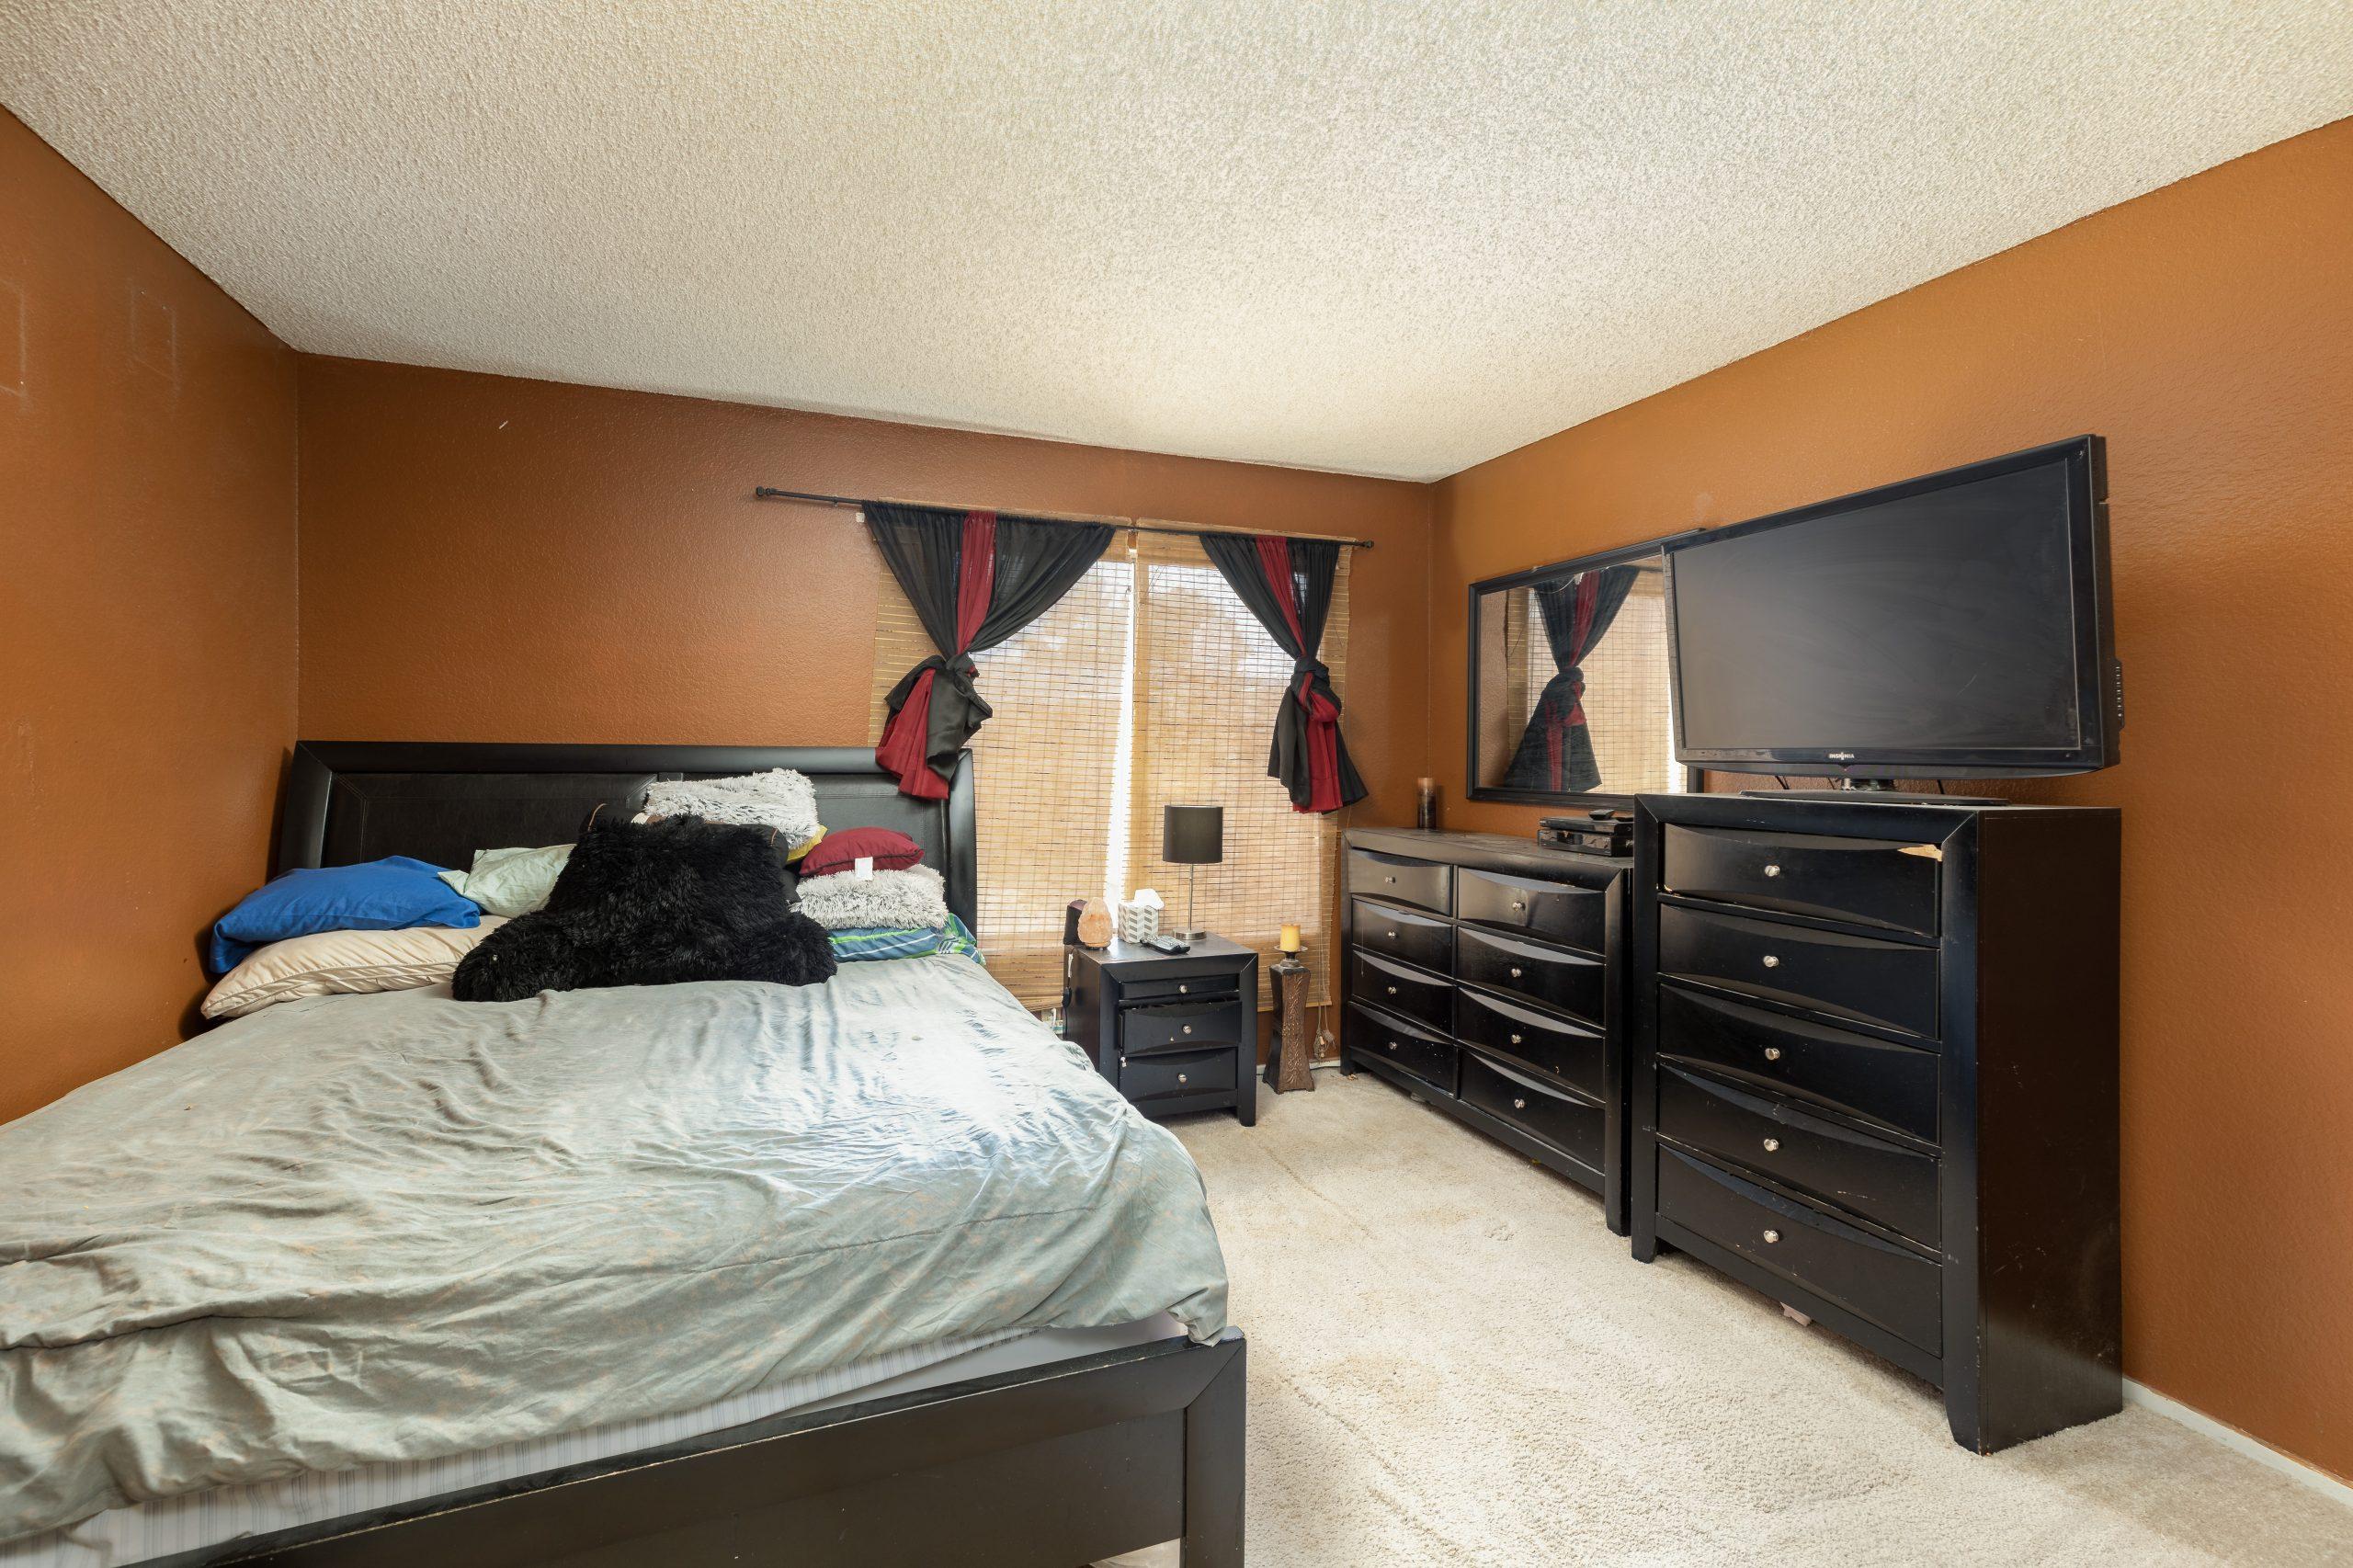 13 Bedroom 2 37518 29th Street East Palmdale CA